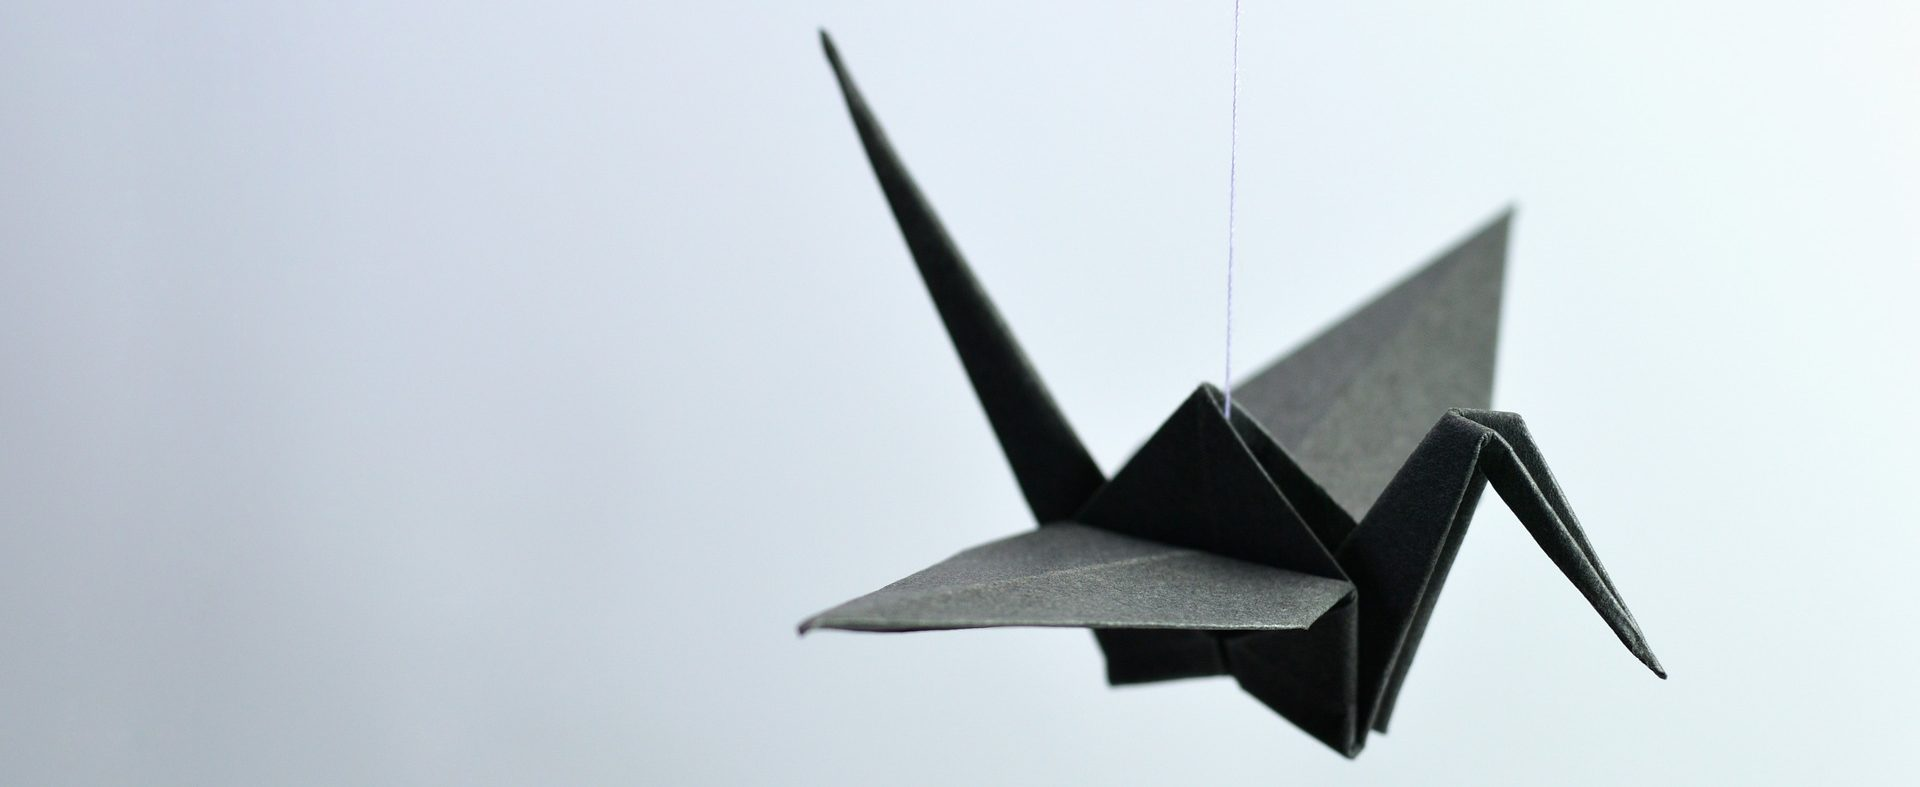 datos-proteccion-origami-cisne-rgpd-lopd